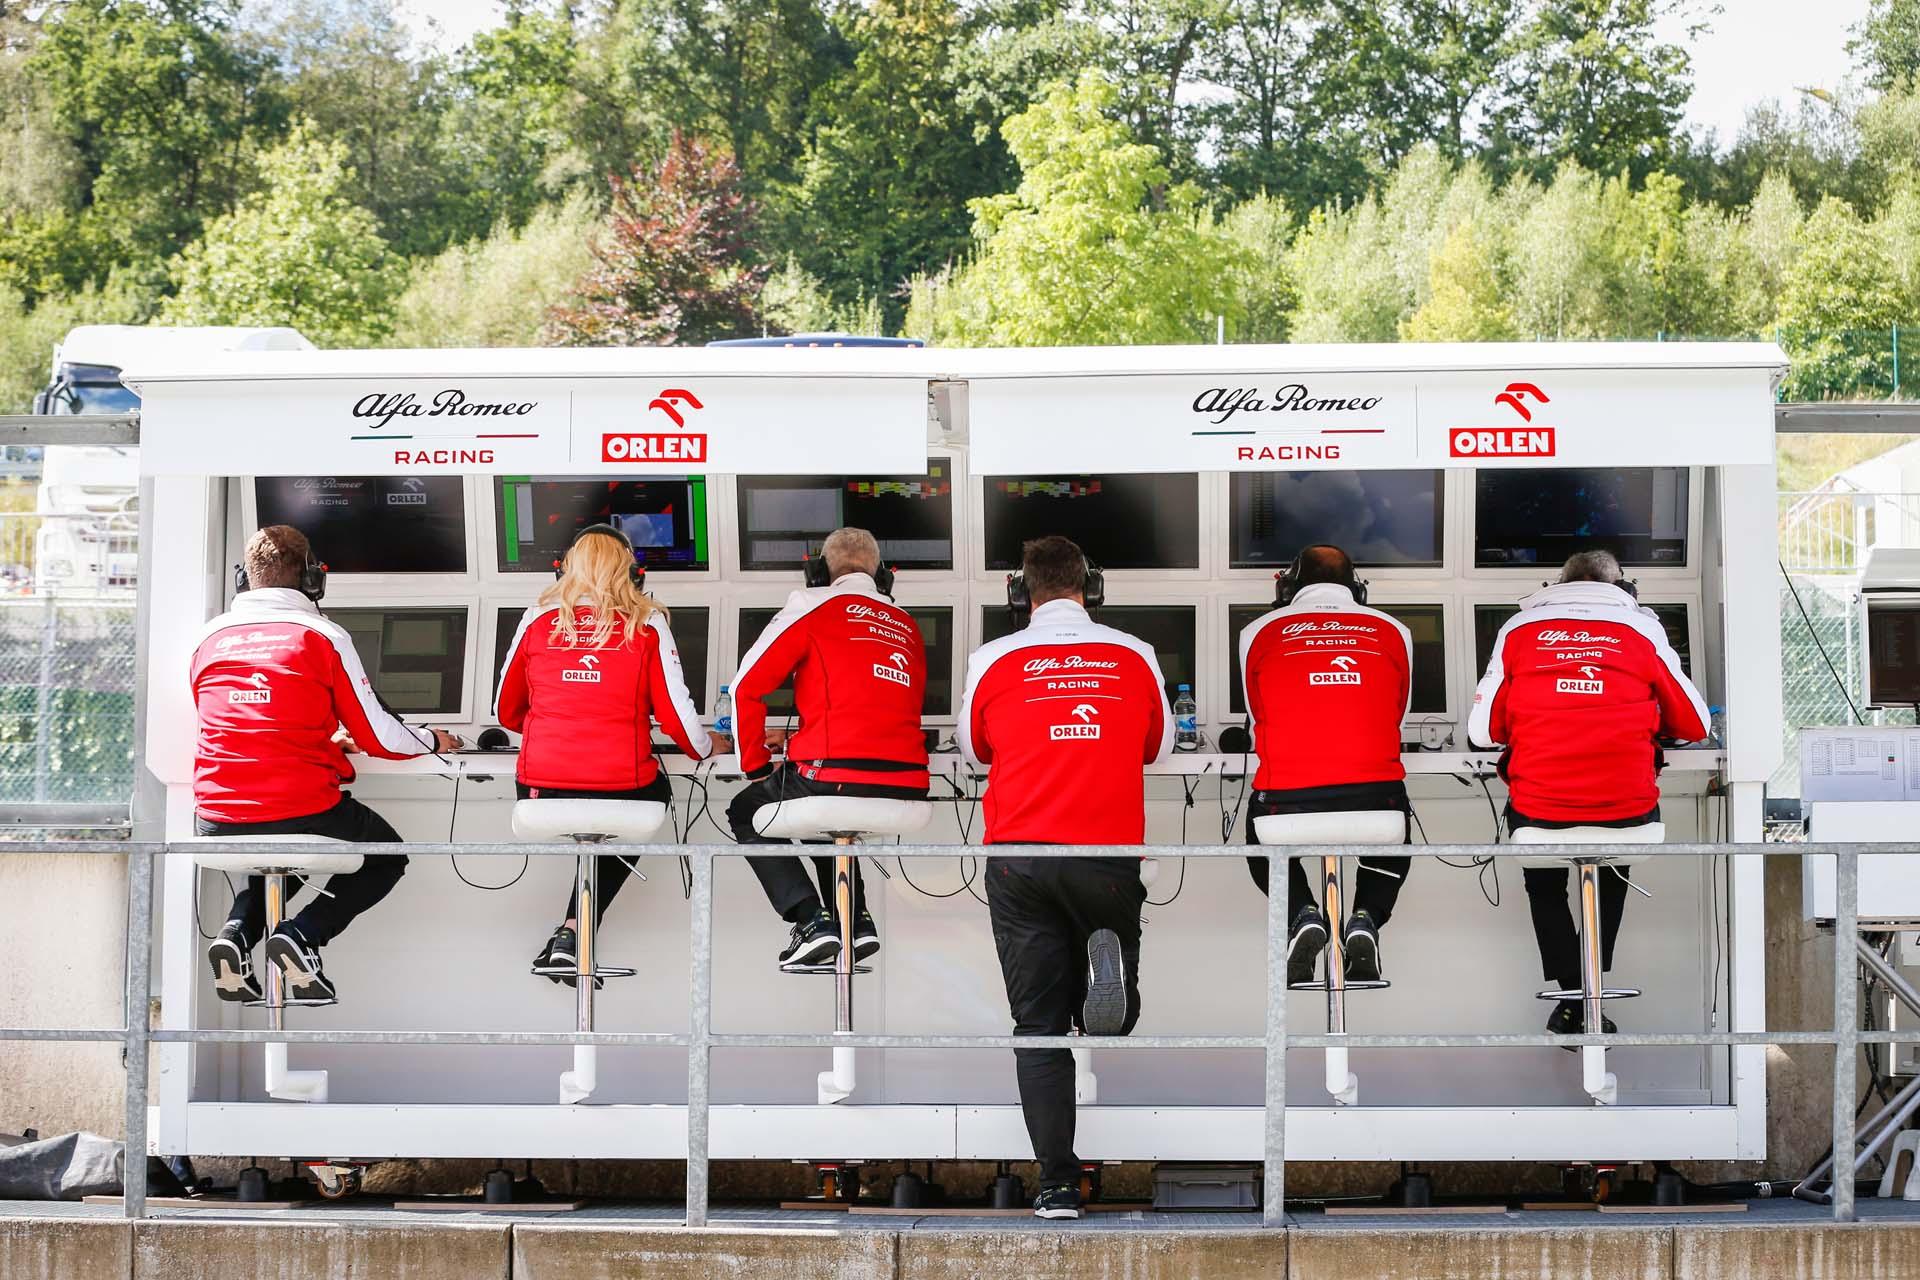 F1 - BELGIAN GRAND PRIX 2020